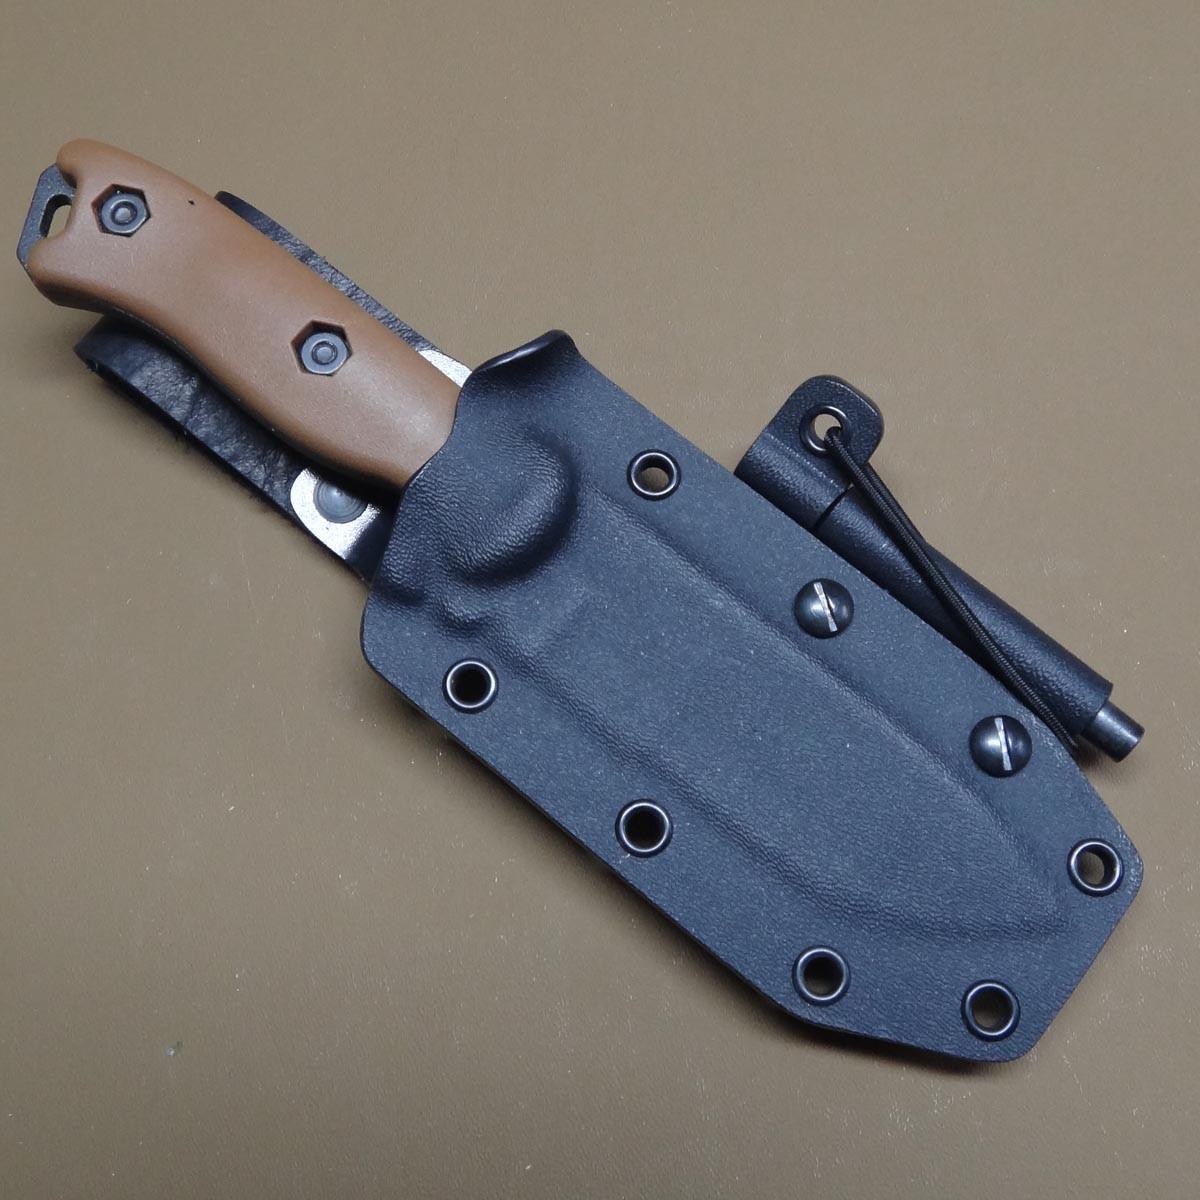 Kydex Knife Sheath: Becker BK16 Grizzly Elite Custom Kydex Sheath